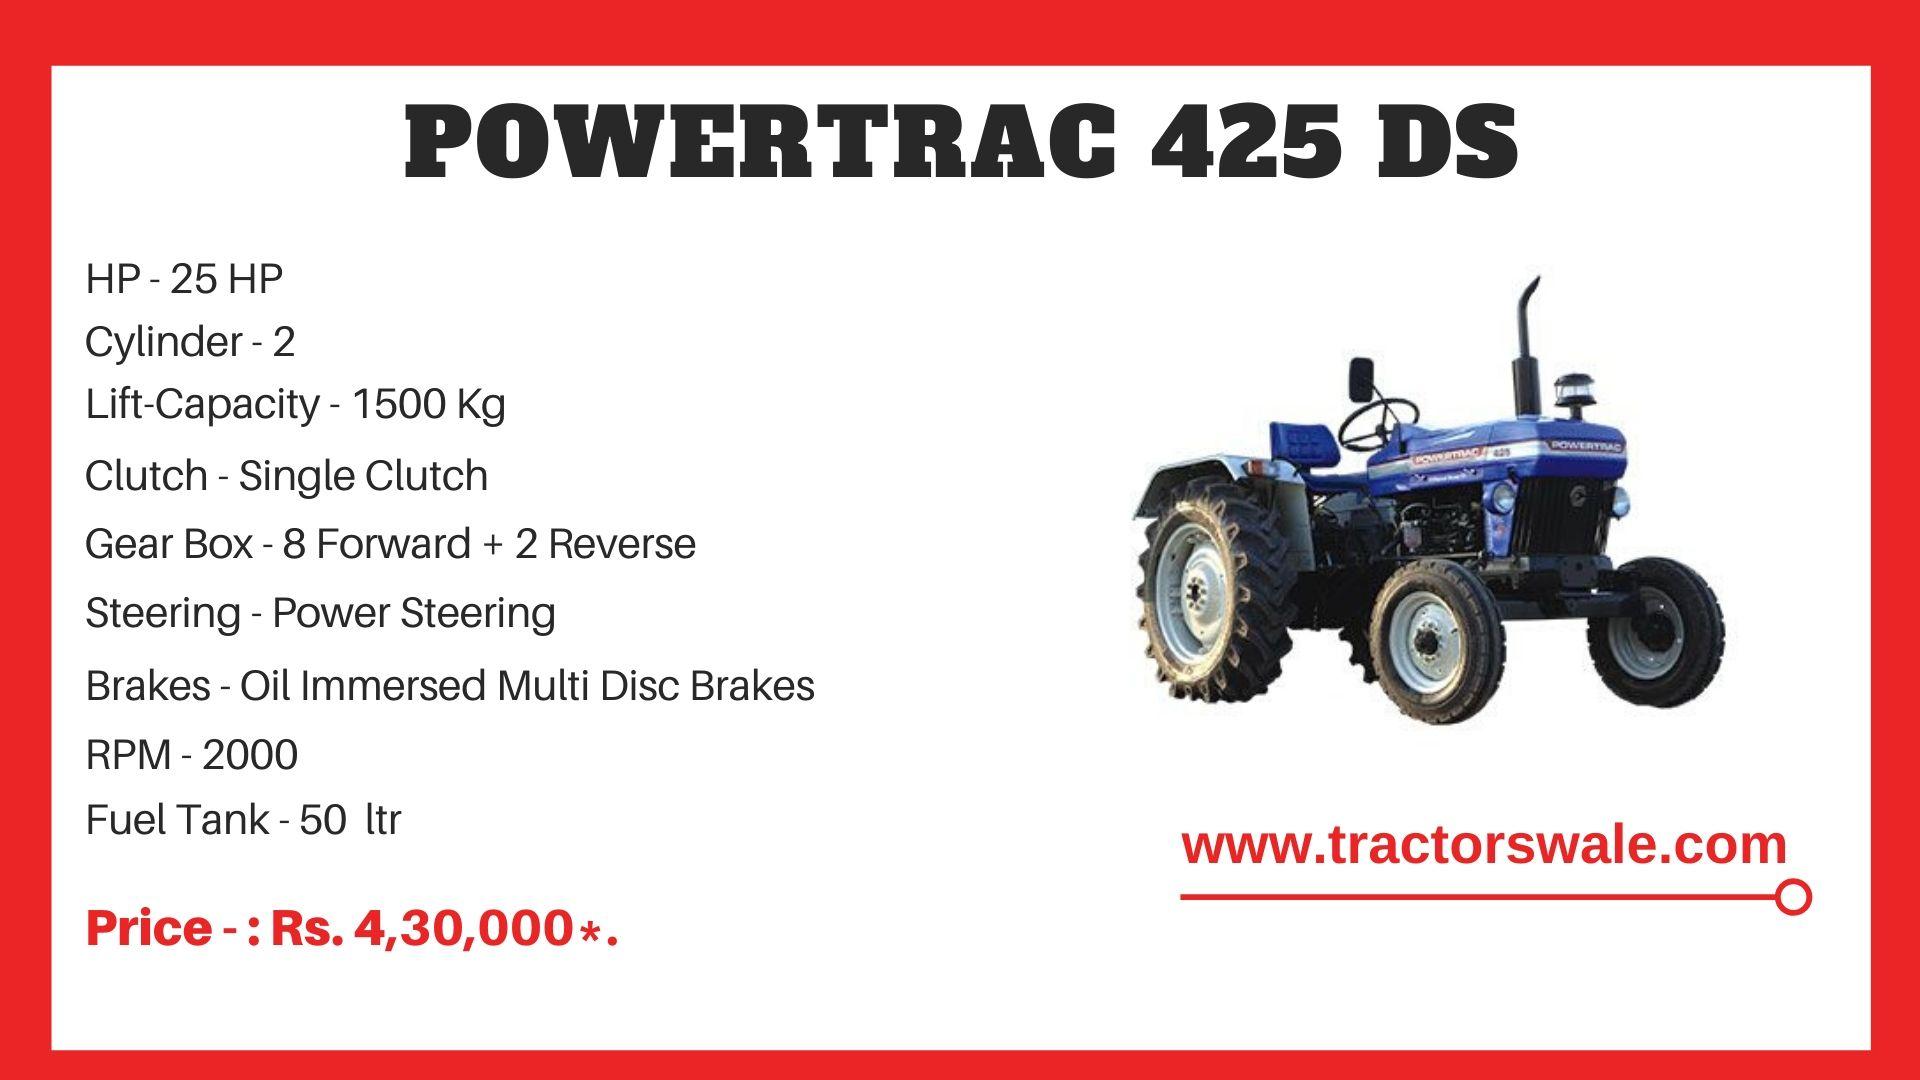 PowerTrac 425 DS Tractor Price